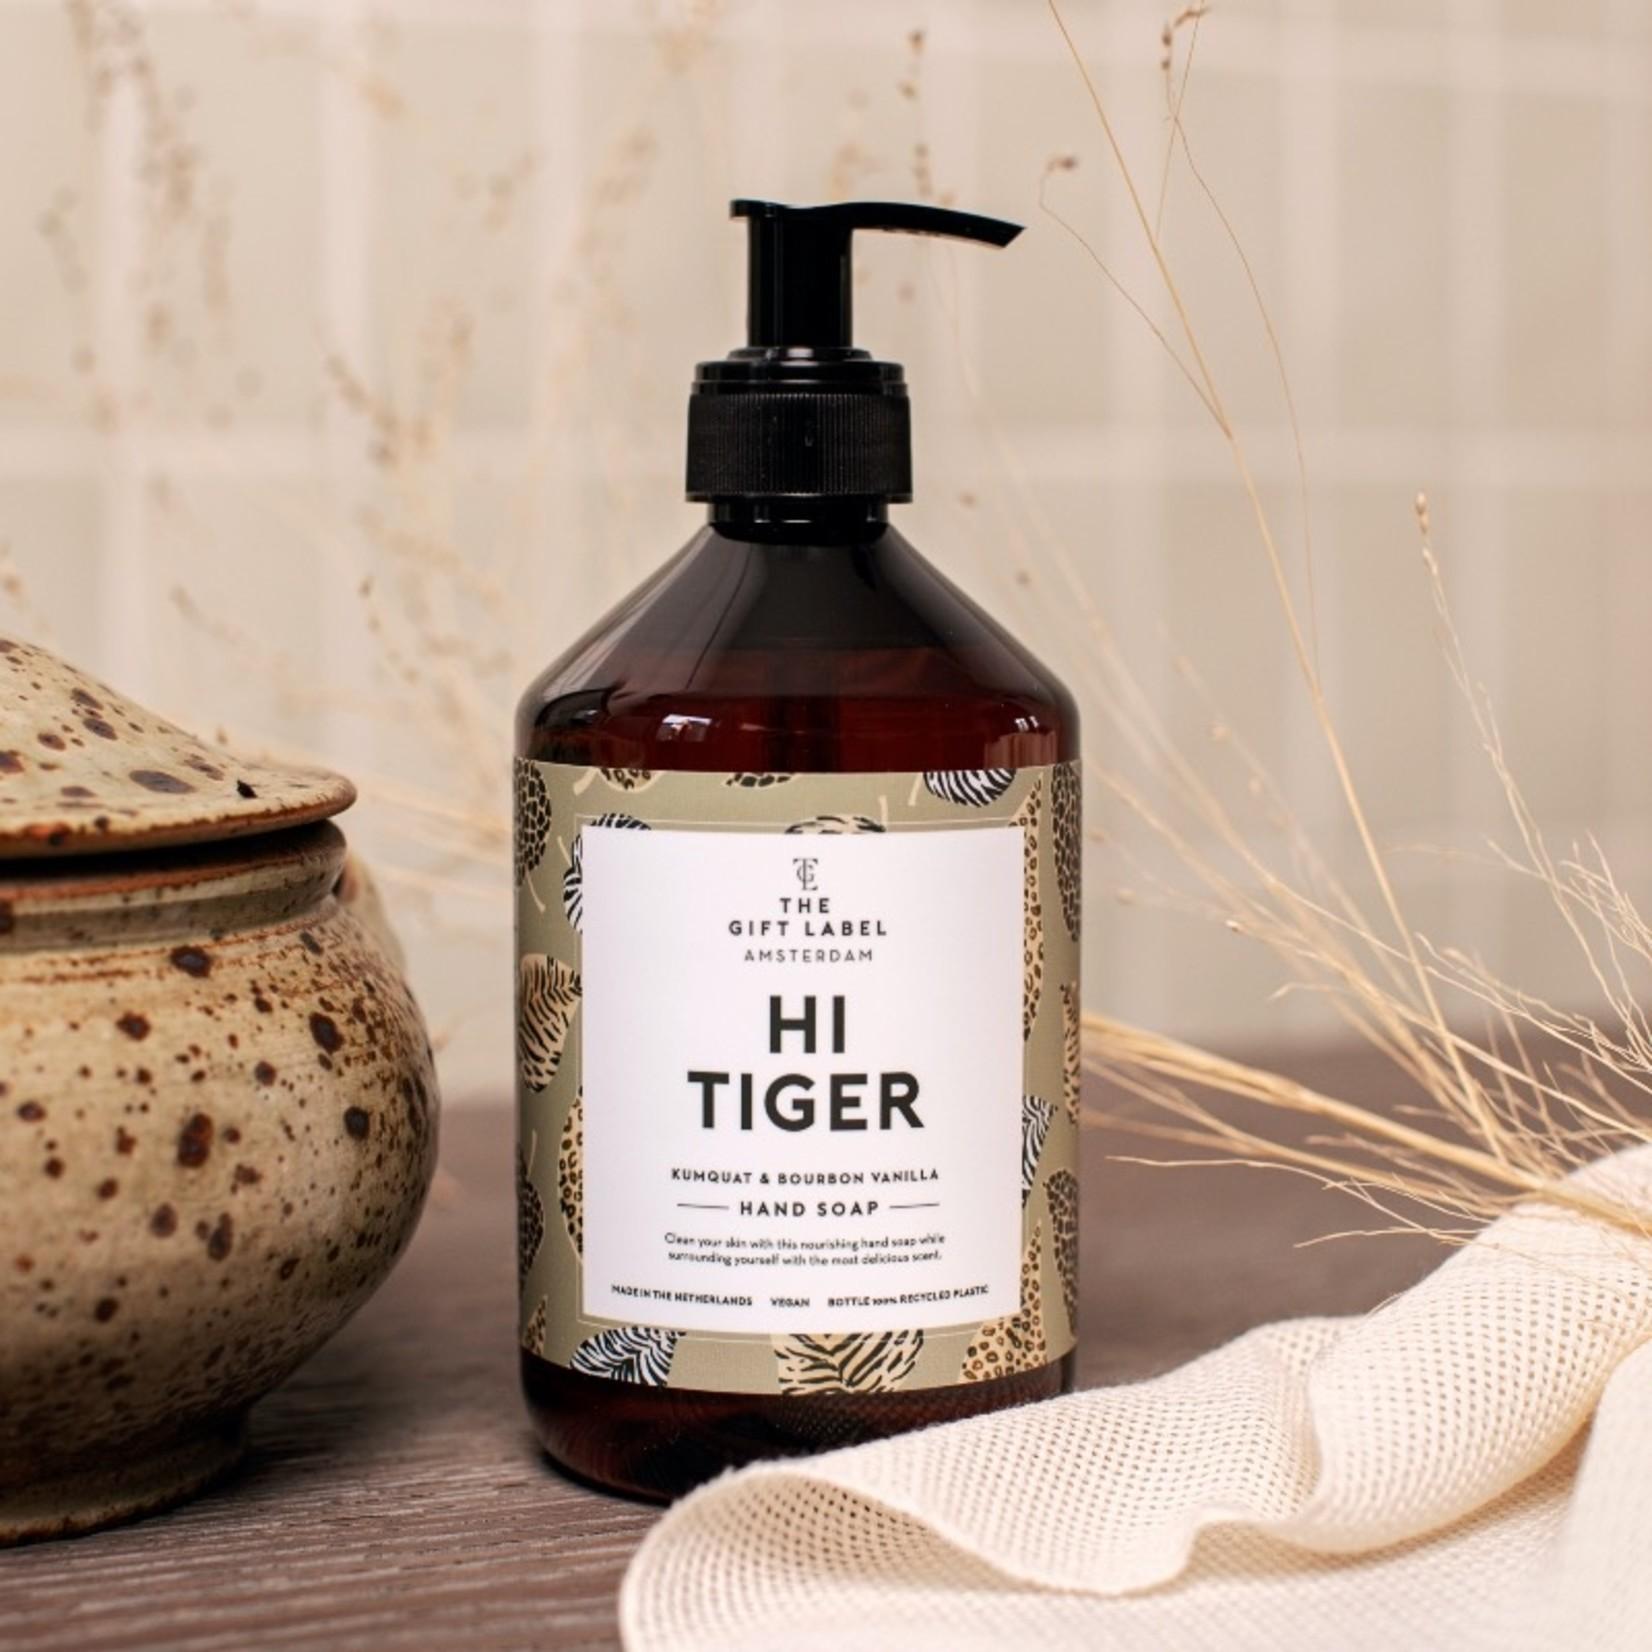 The gift label Handzeep - Hi tiger